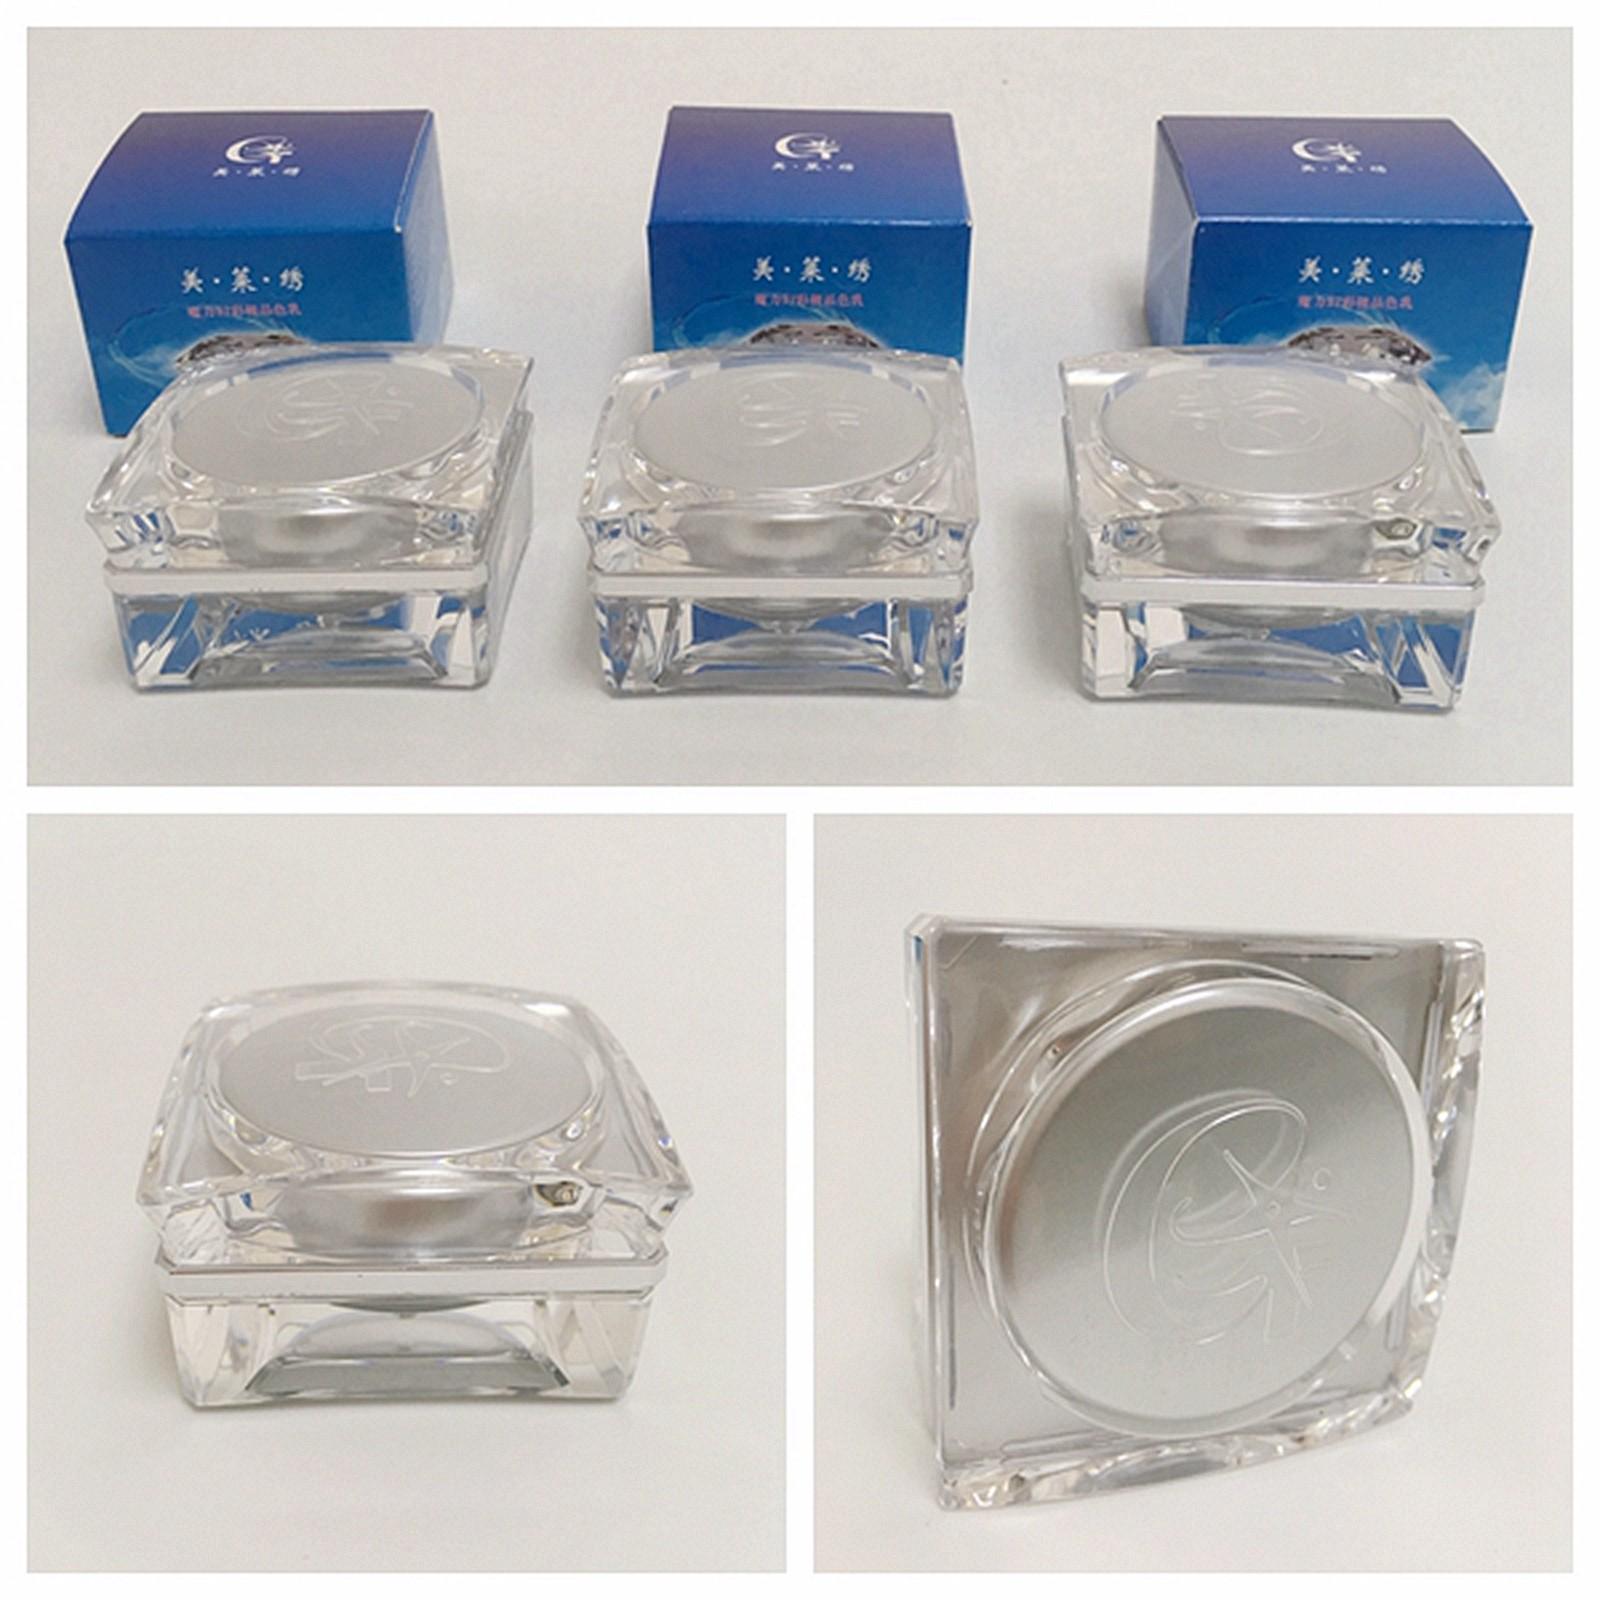 BoLin-Pigment Makeup Manufacturer Natural Permanent Makeup Pigment-1